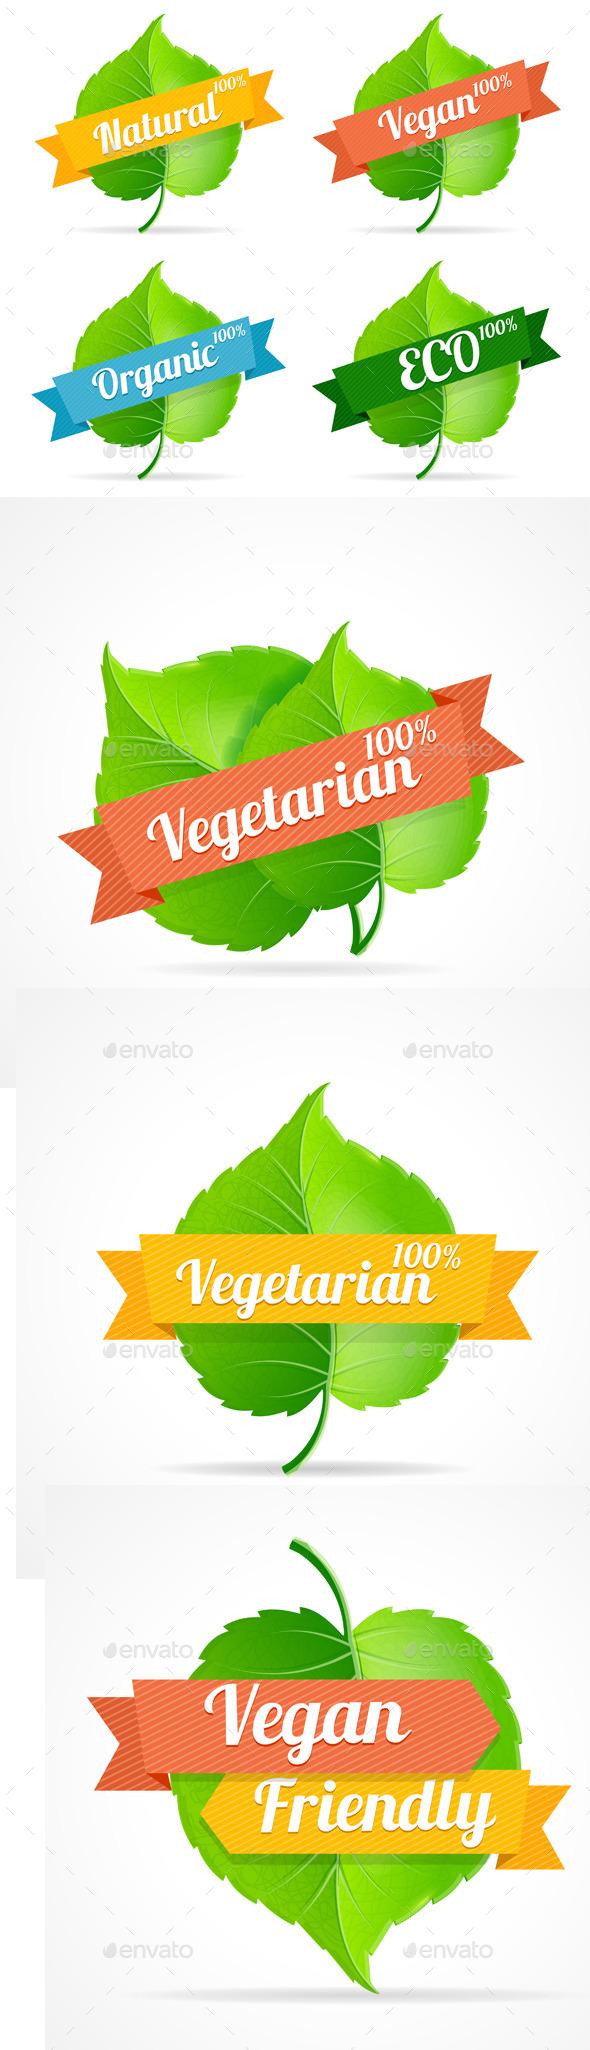 Vector Vegan Shop Labels Set - Commercial / Shopping Conceptual